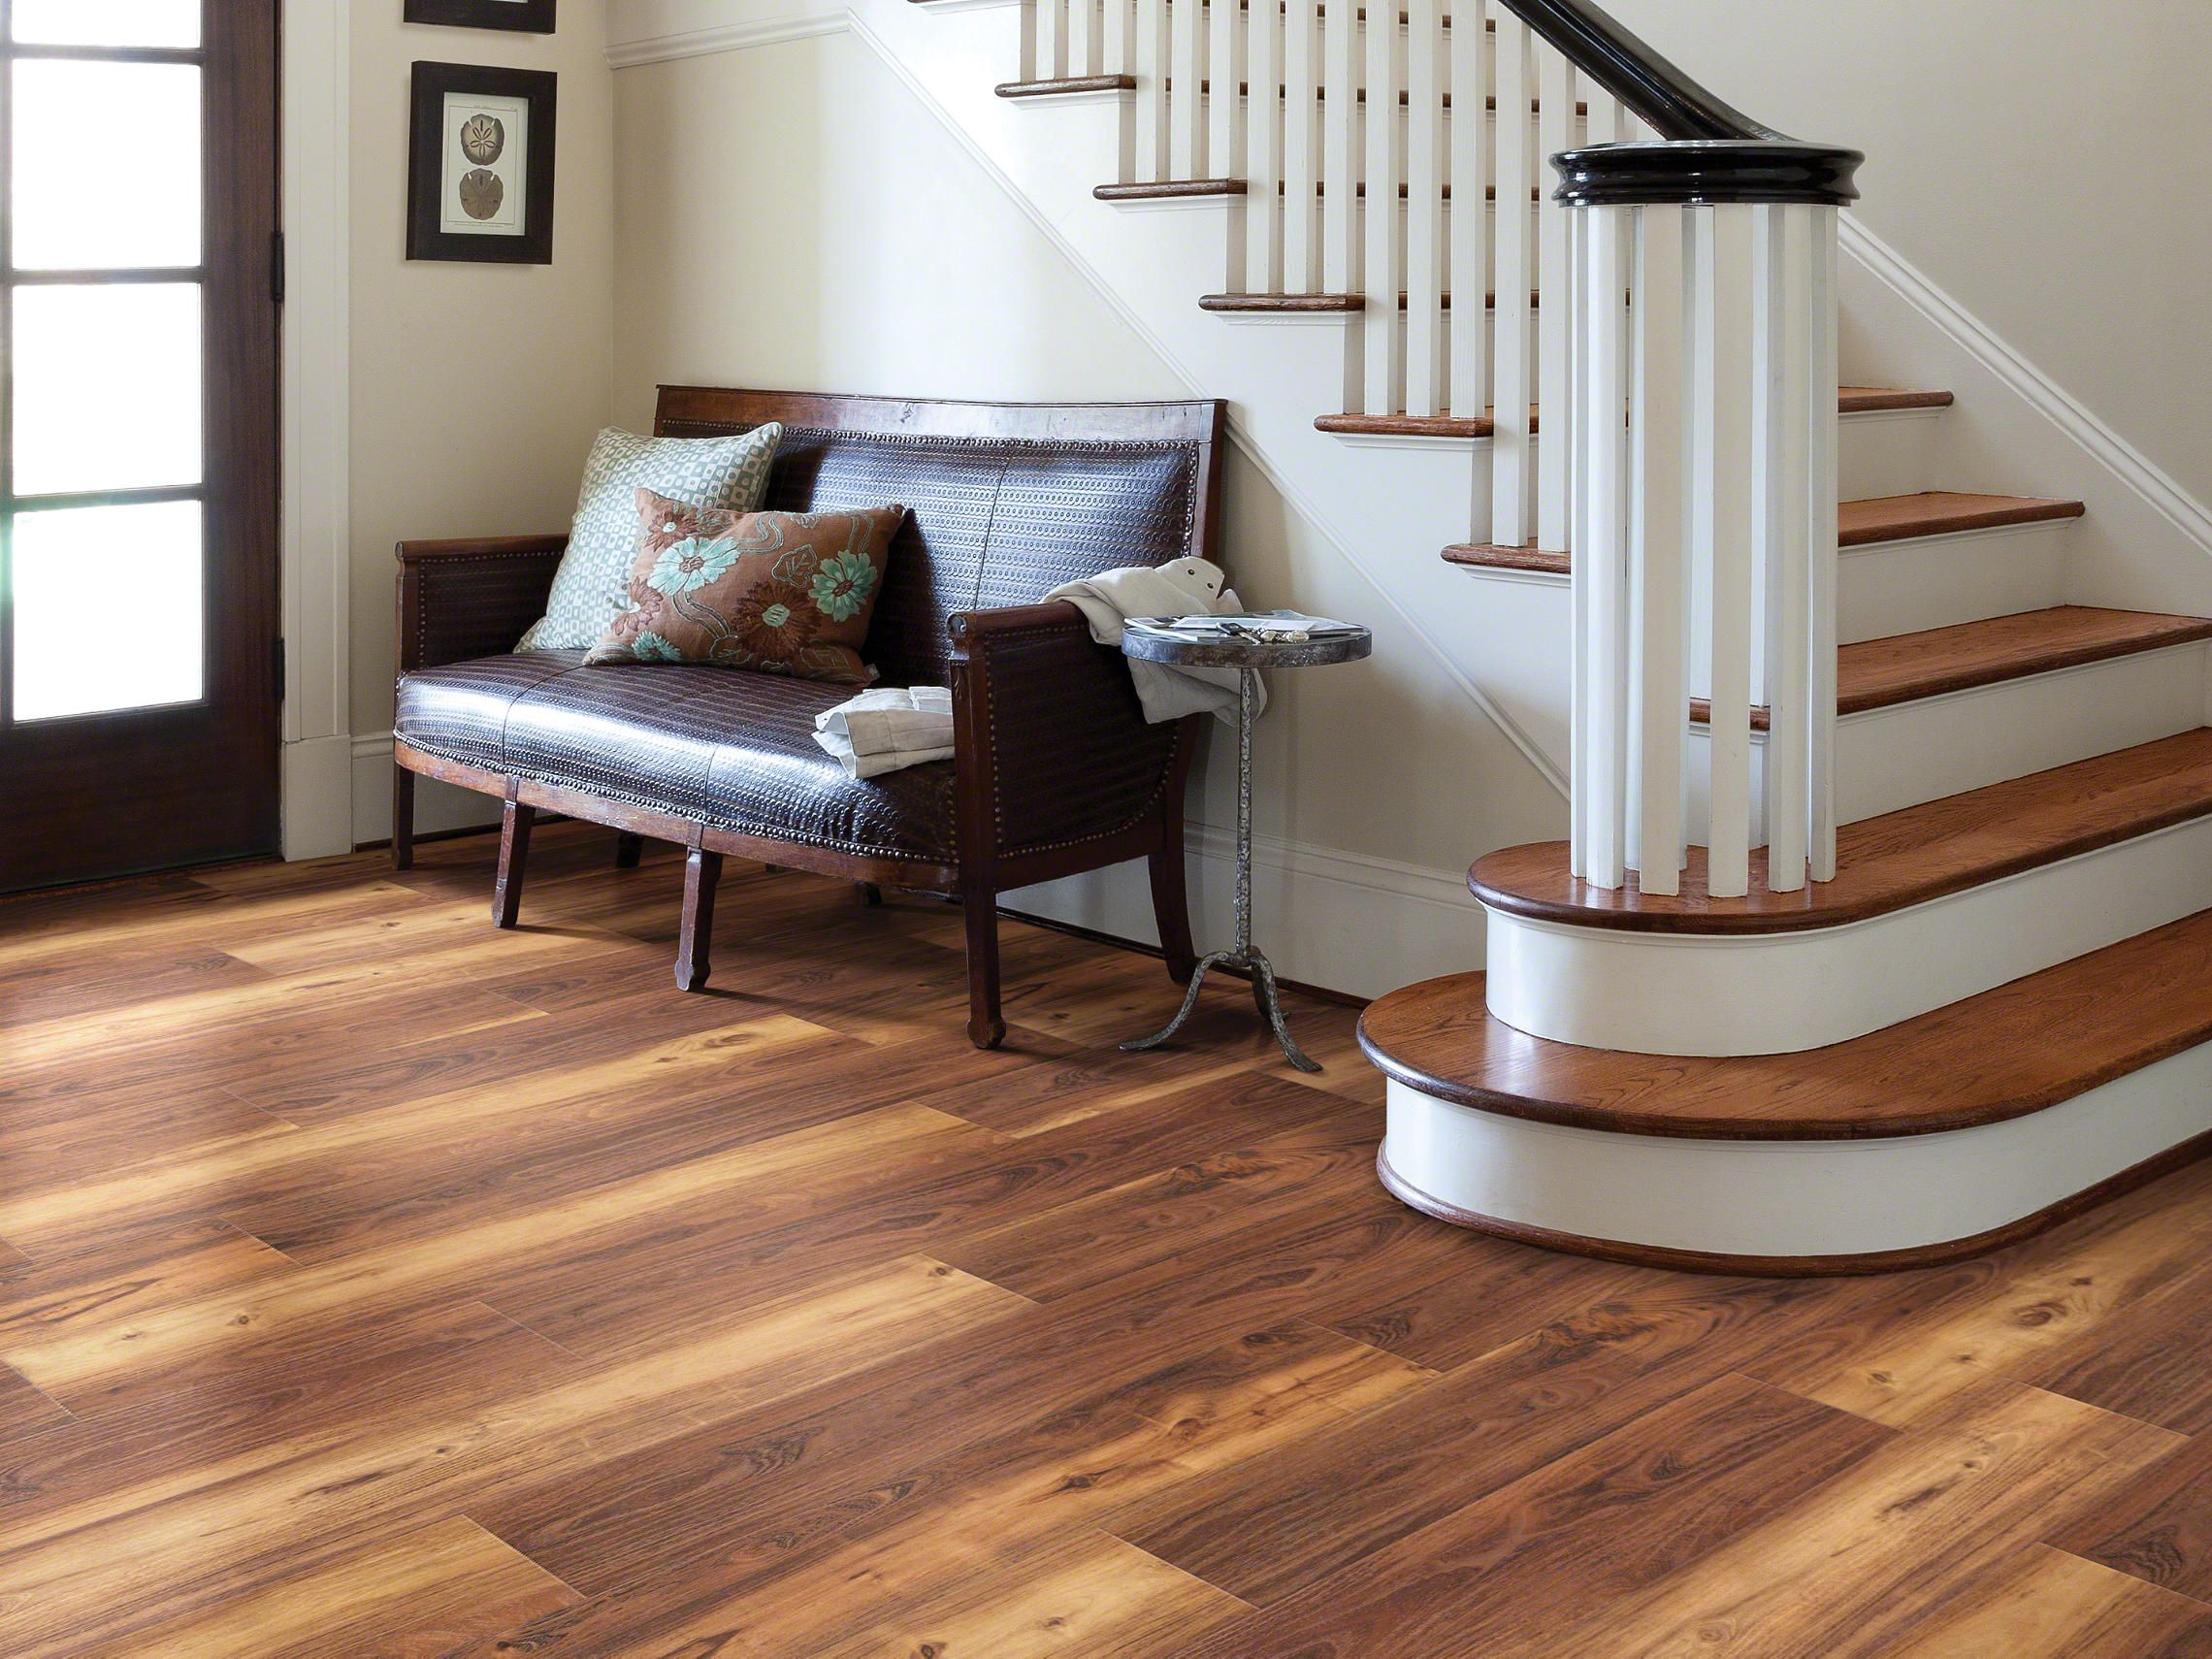 Resilient Vinyl Flooring Vinyl Plank Lvt Engineered Wood Floors Engineered Hardwood Wood Floors Wide Plank